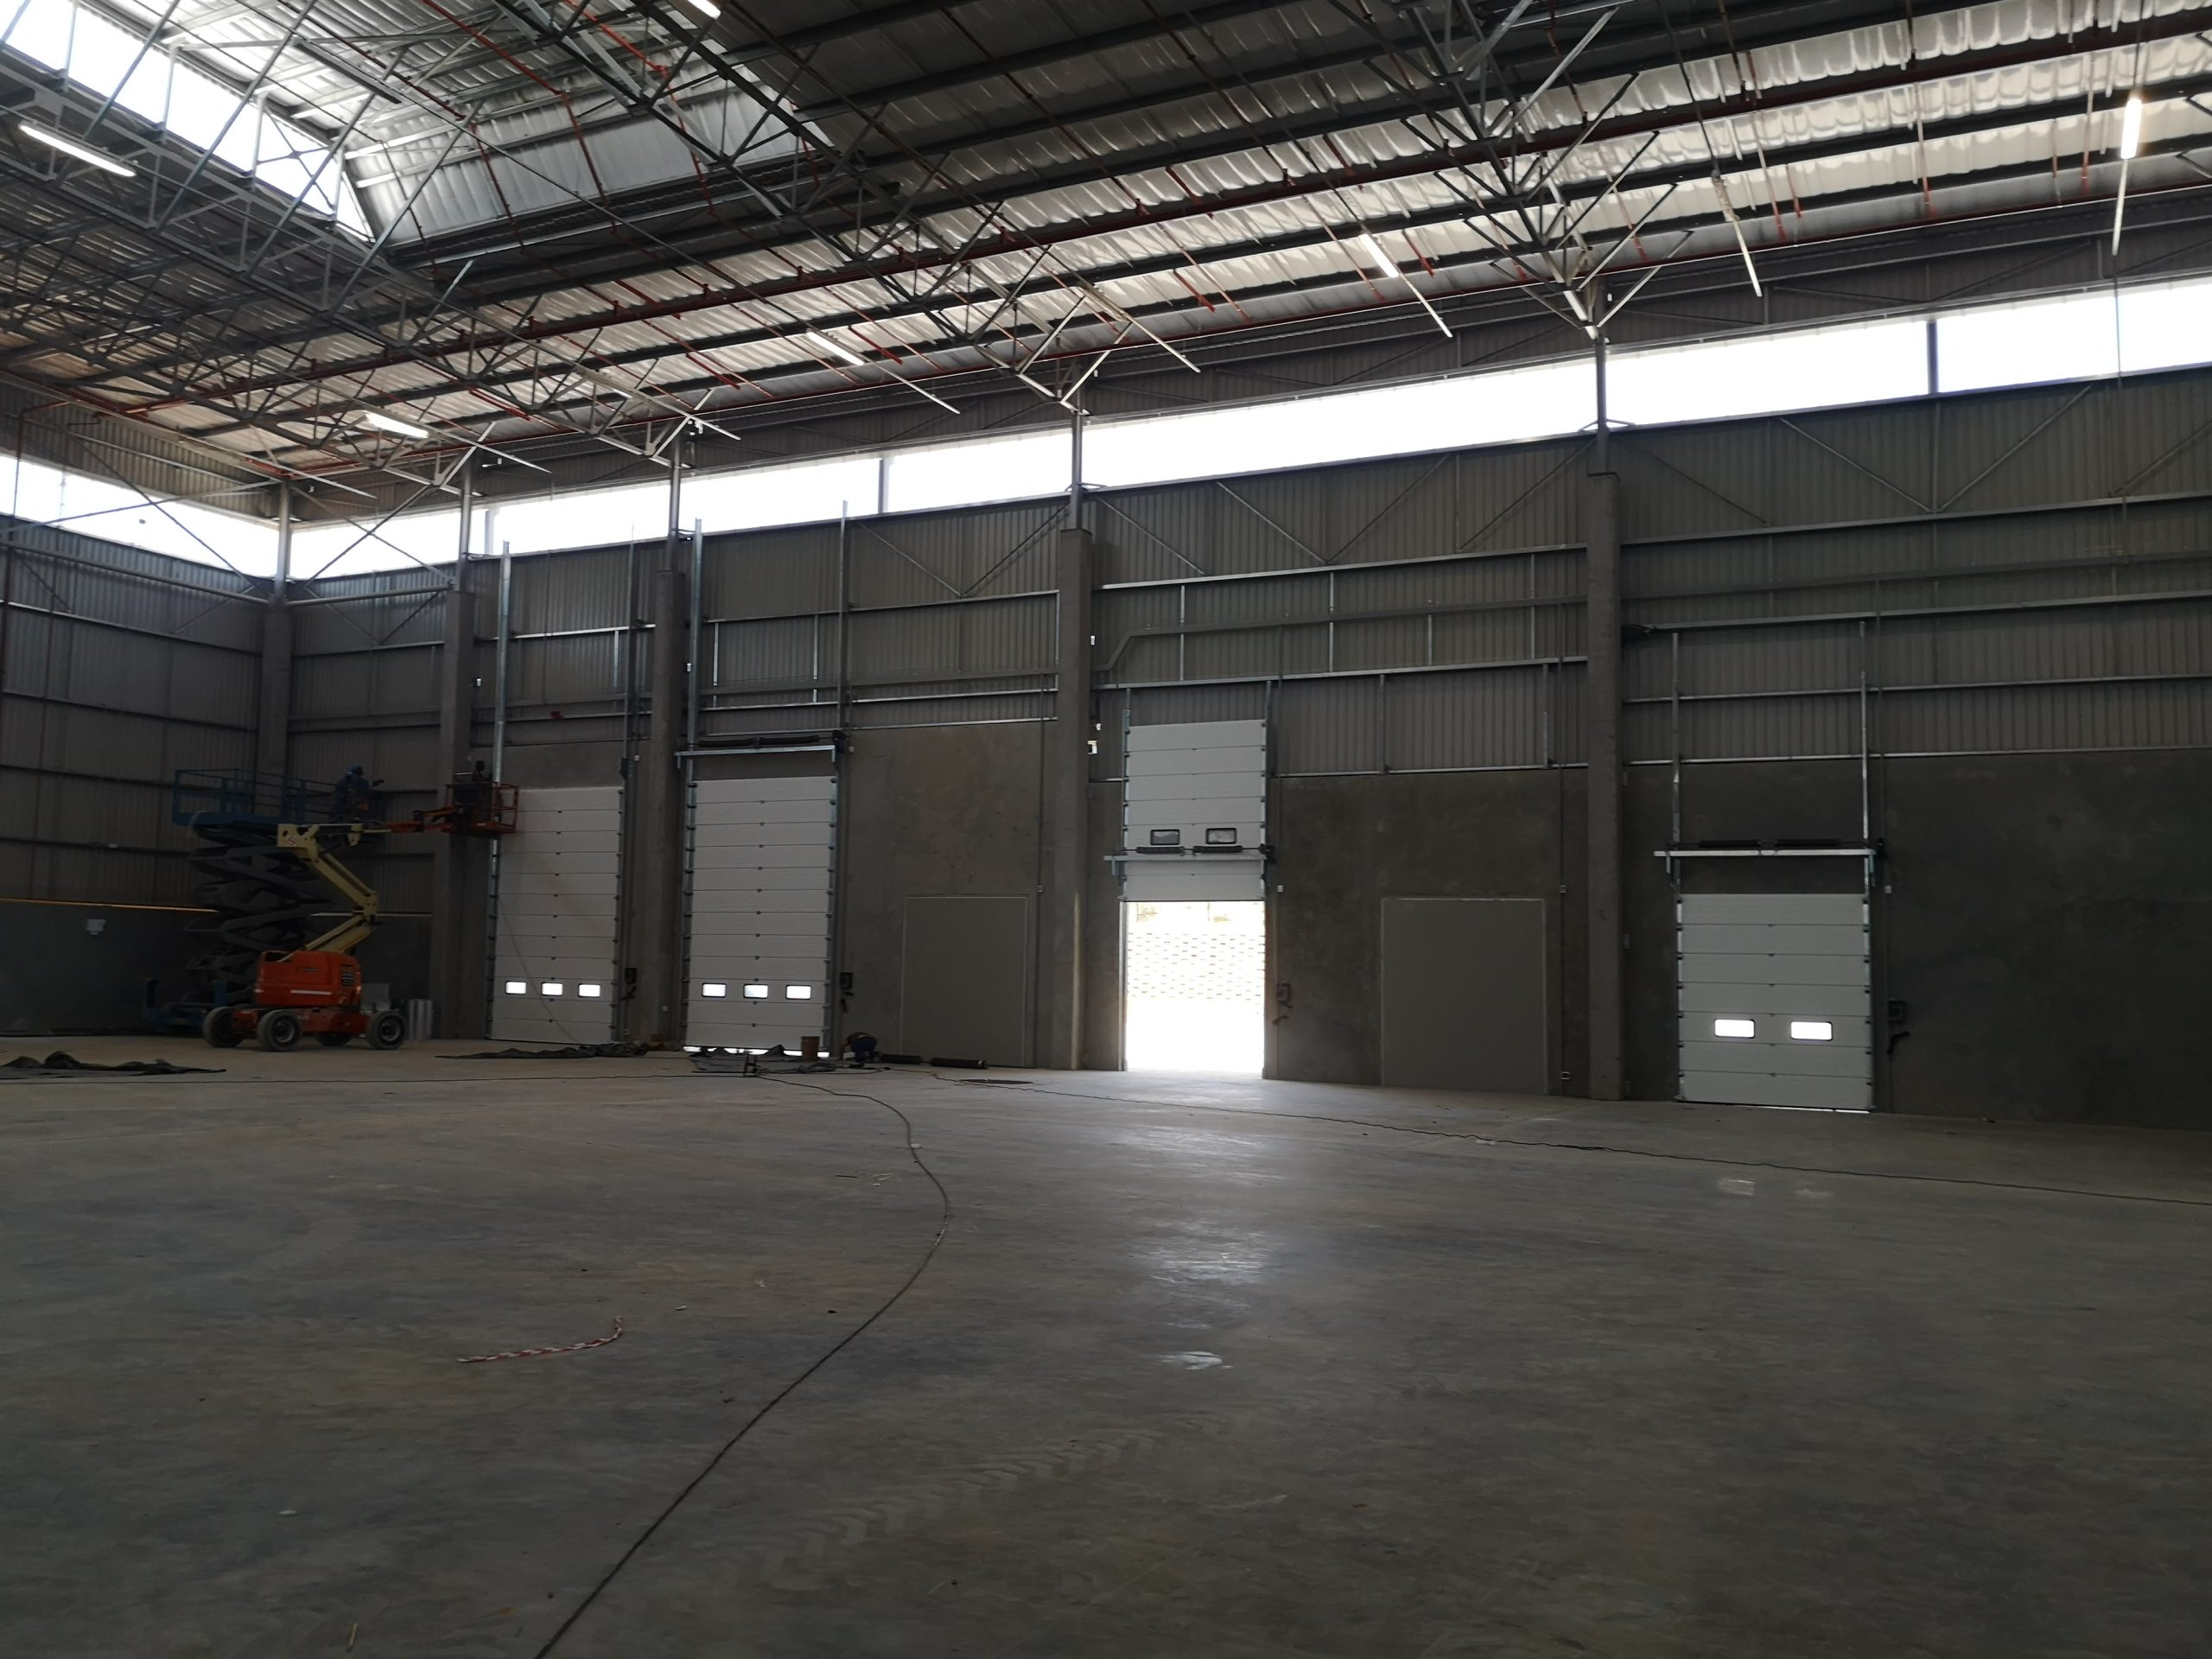 12462m² Warehouse Space to Rent Longlake Longlake Logistics Park